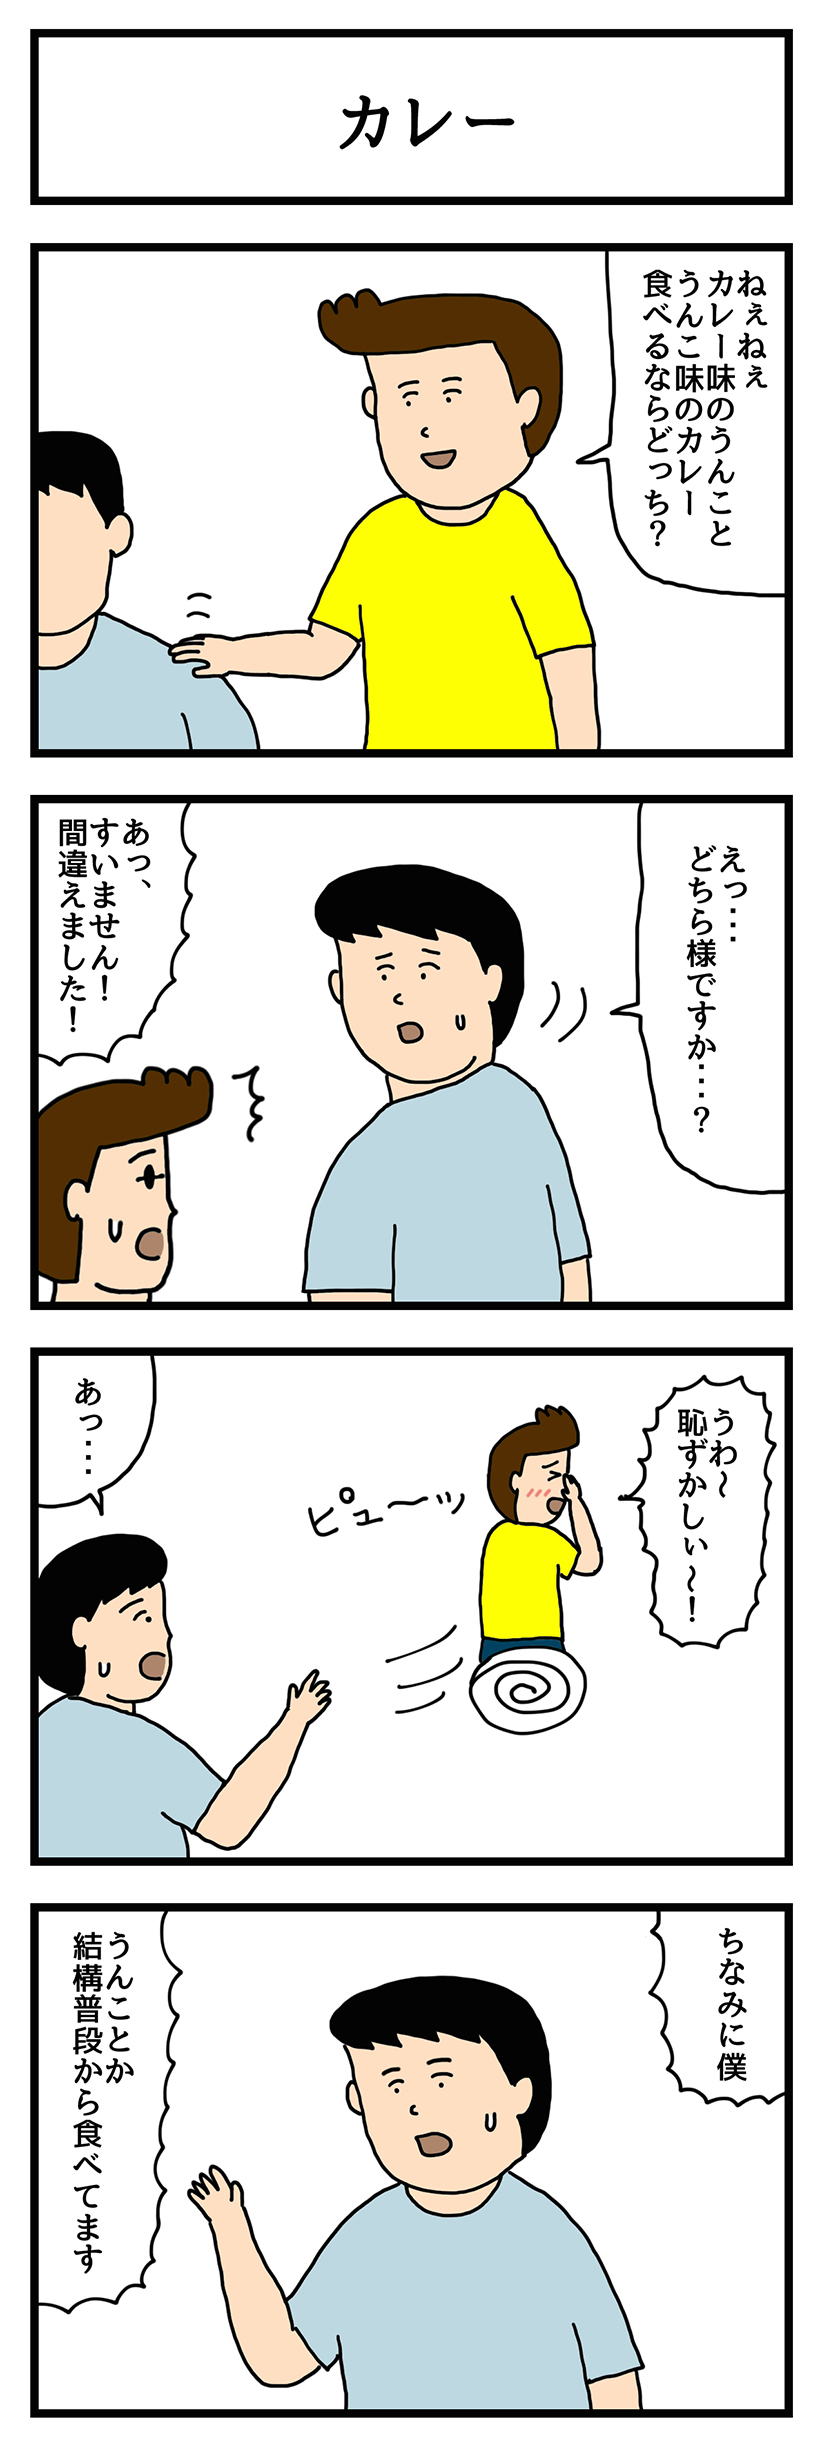 20160729-mn02 (1)